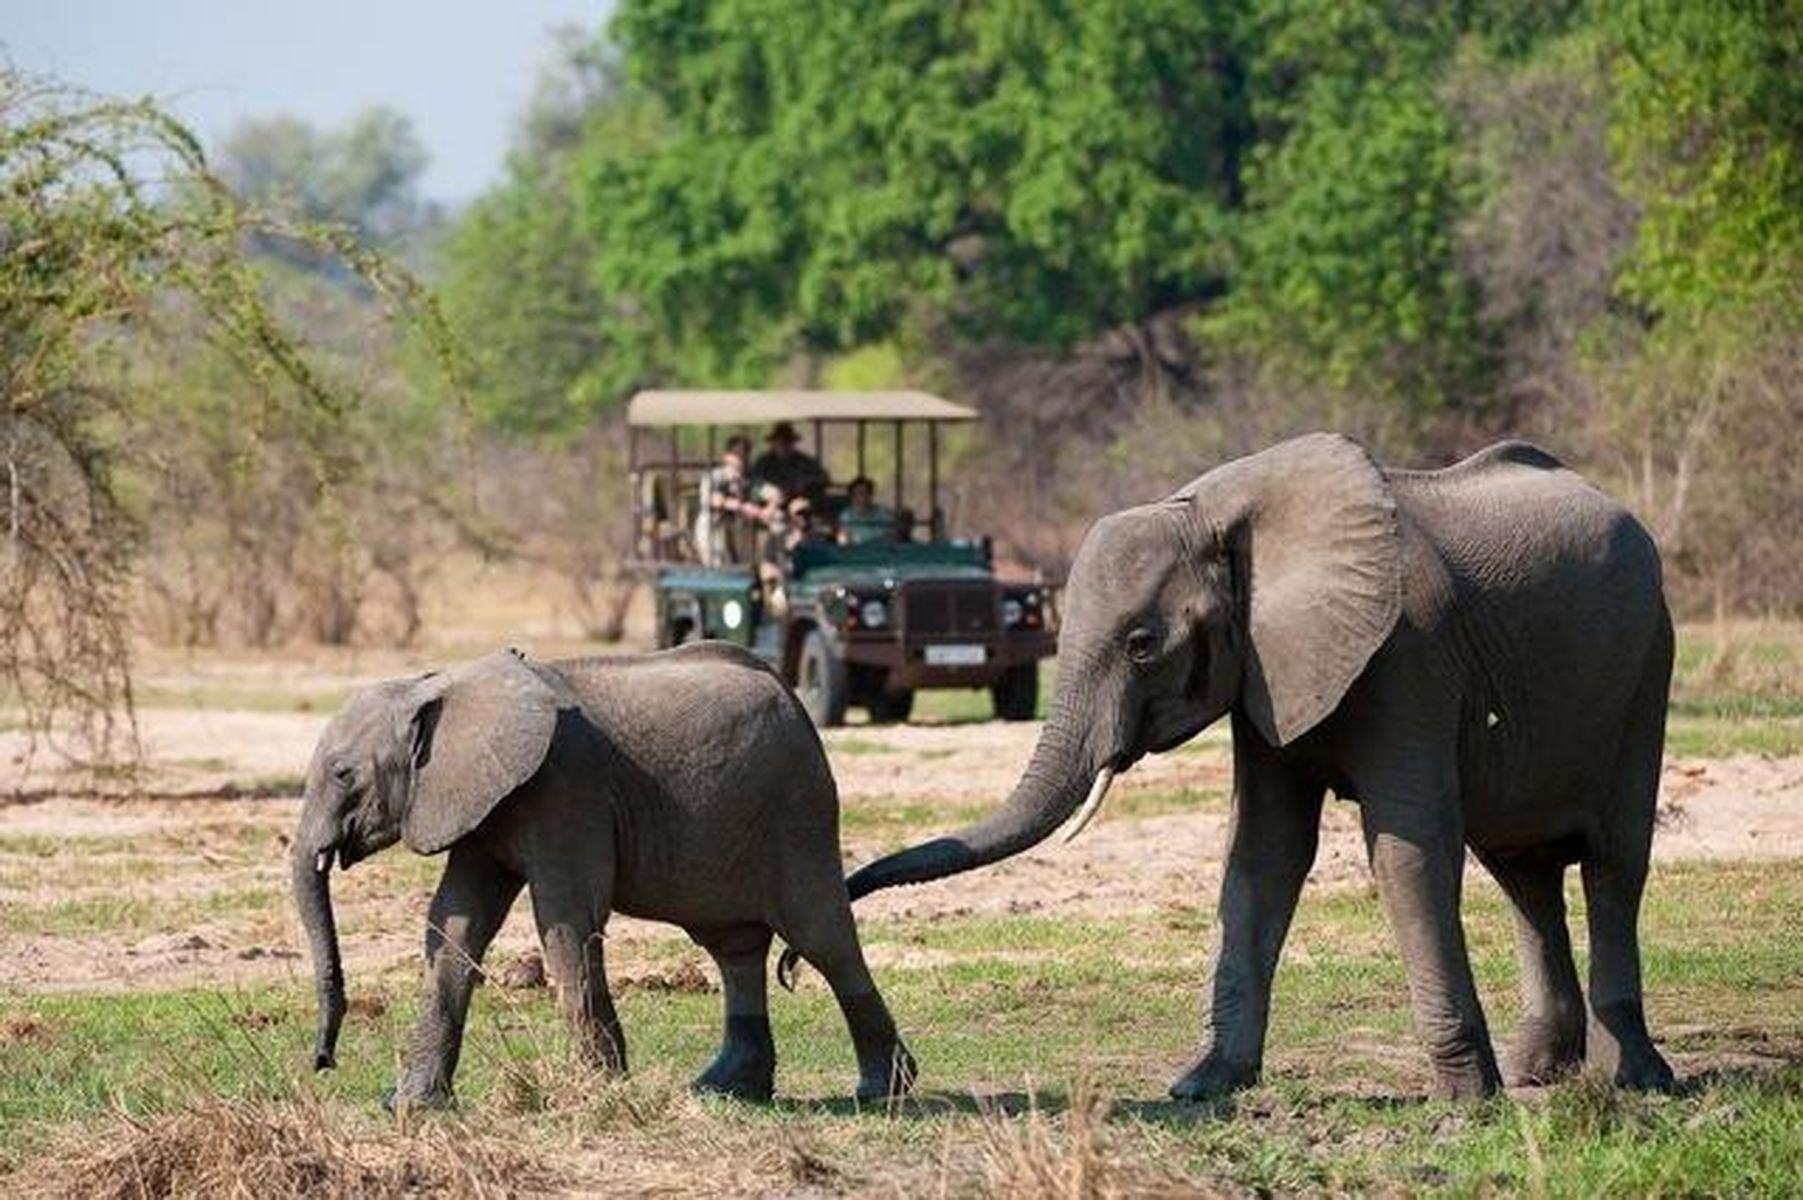 7-Day South Luangwa & Victoria Falls Safari - Zambia Itinerary